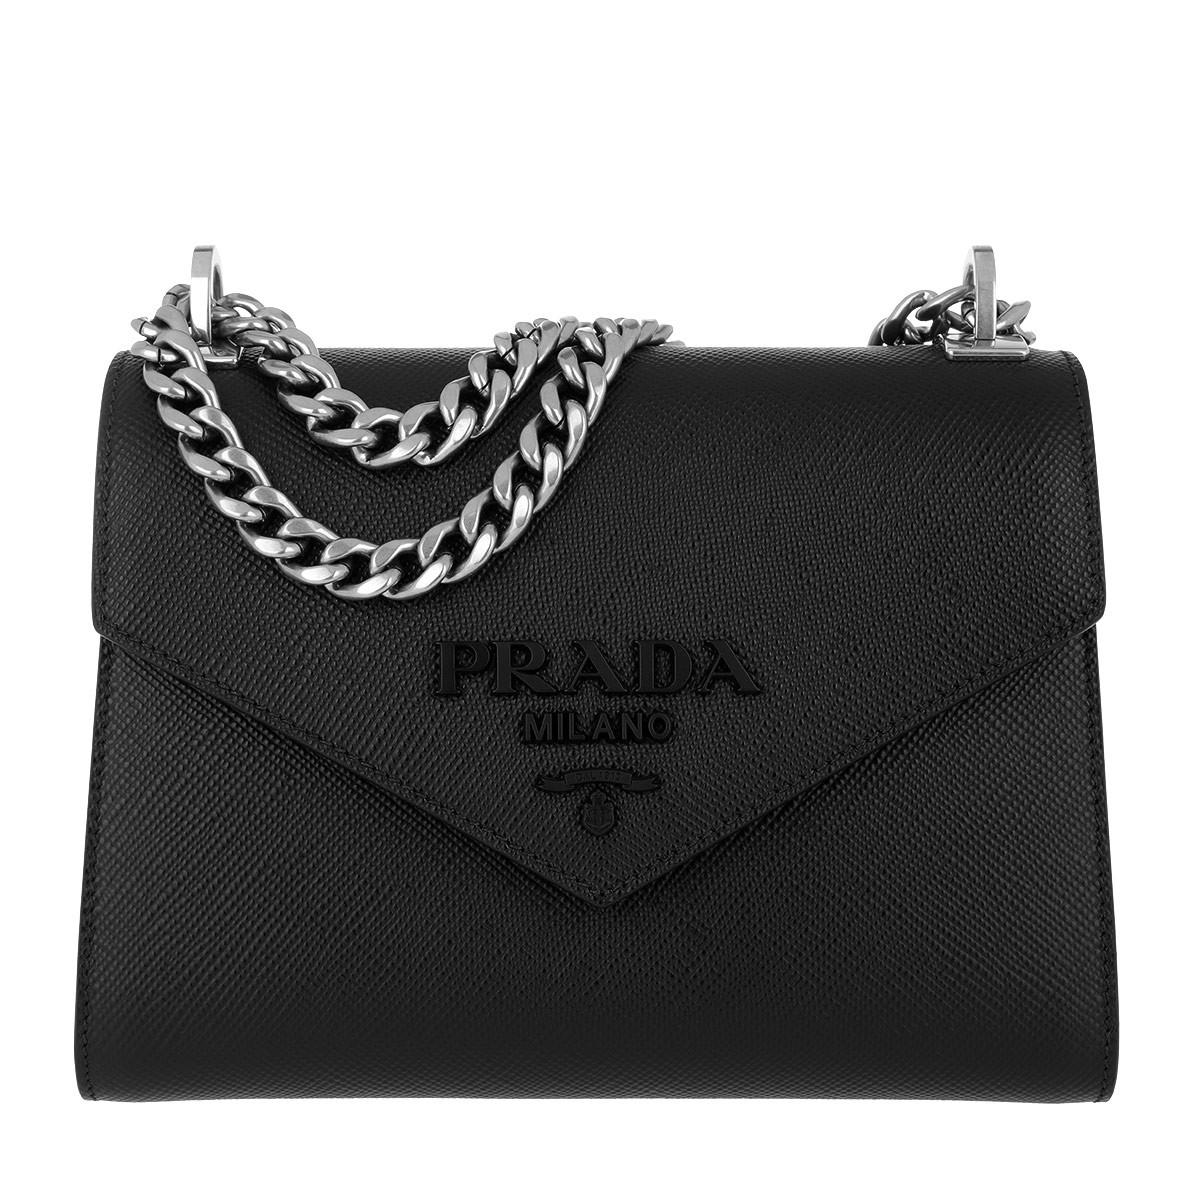 3fbd9a8812ad83 Prada - Black Monochrome Crossbody Bag Medium Nero - Lyst. View fullscreen